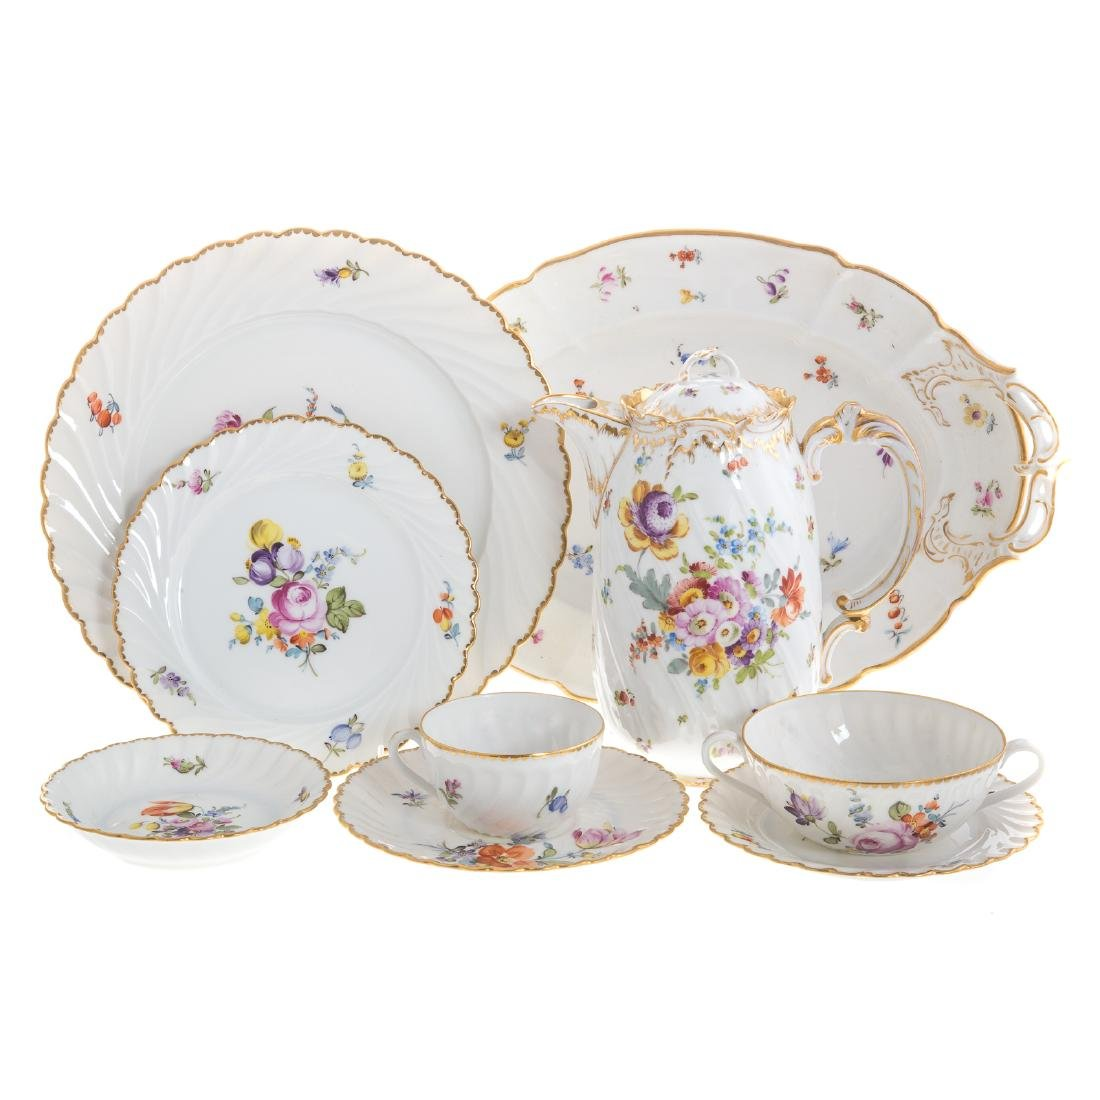 Nymphenburg porcelain dinner service